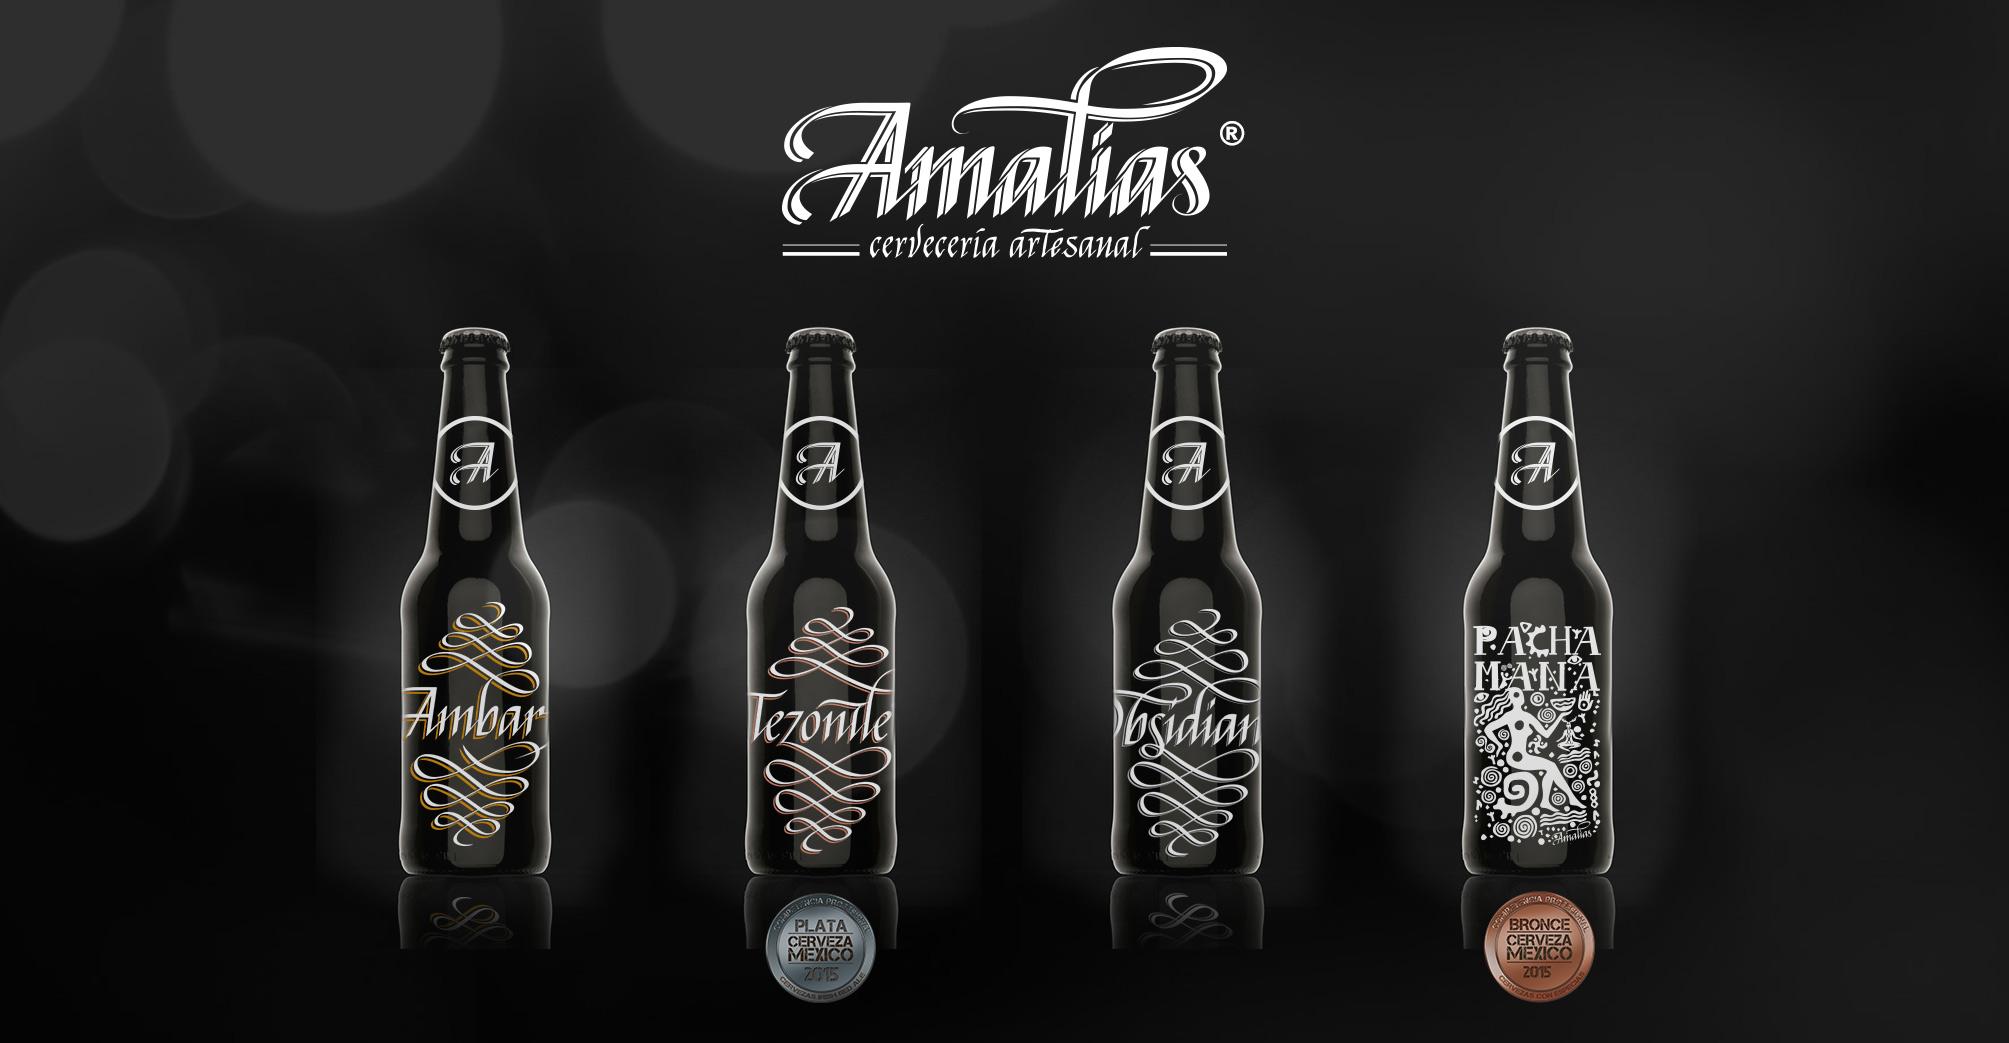 Cerveceria Artesanal Amalias